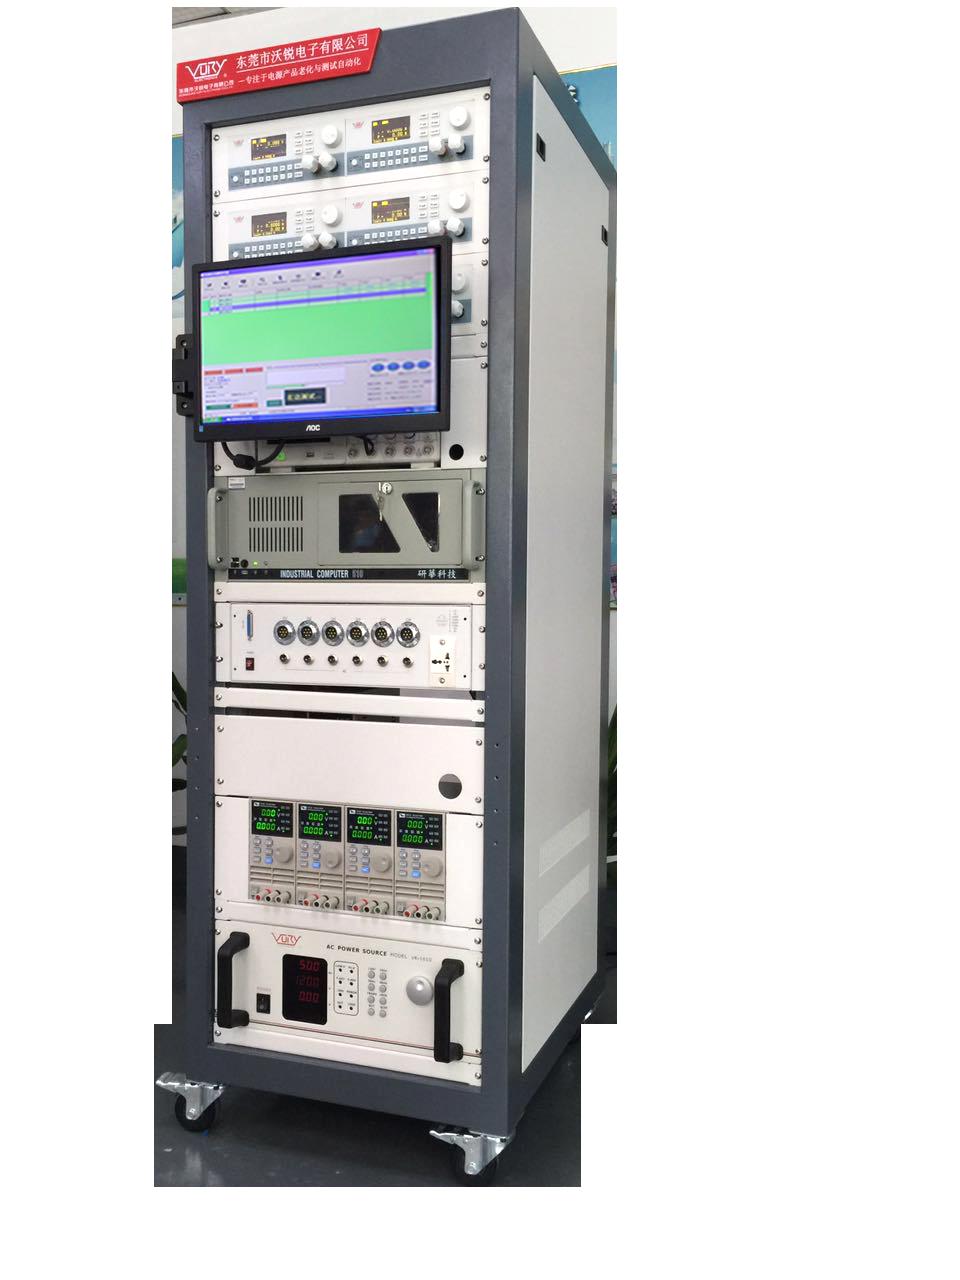 ATE-808LB 移动电源(充电宝)综合测试系统